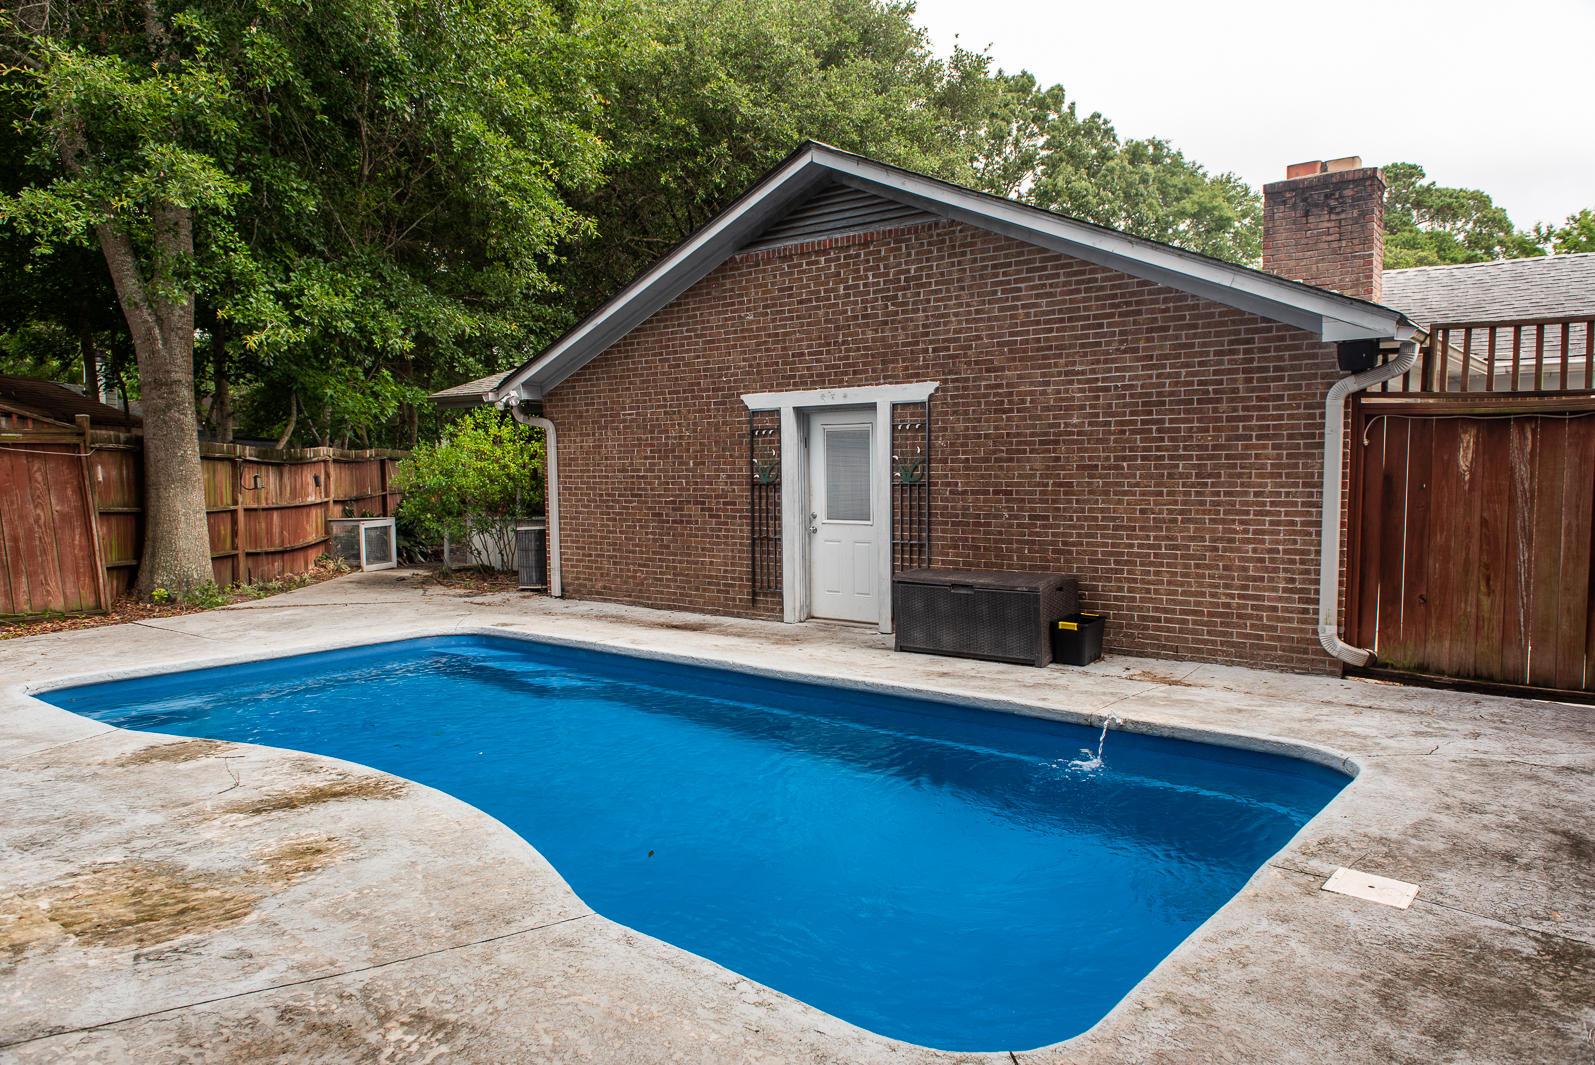 Wando East Homes For Sale - 1605 Babington, Mount Pleasant, SC - 3